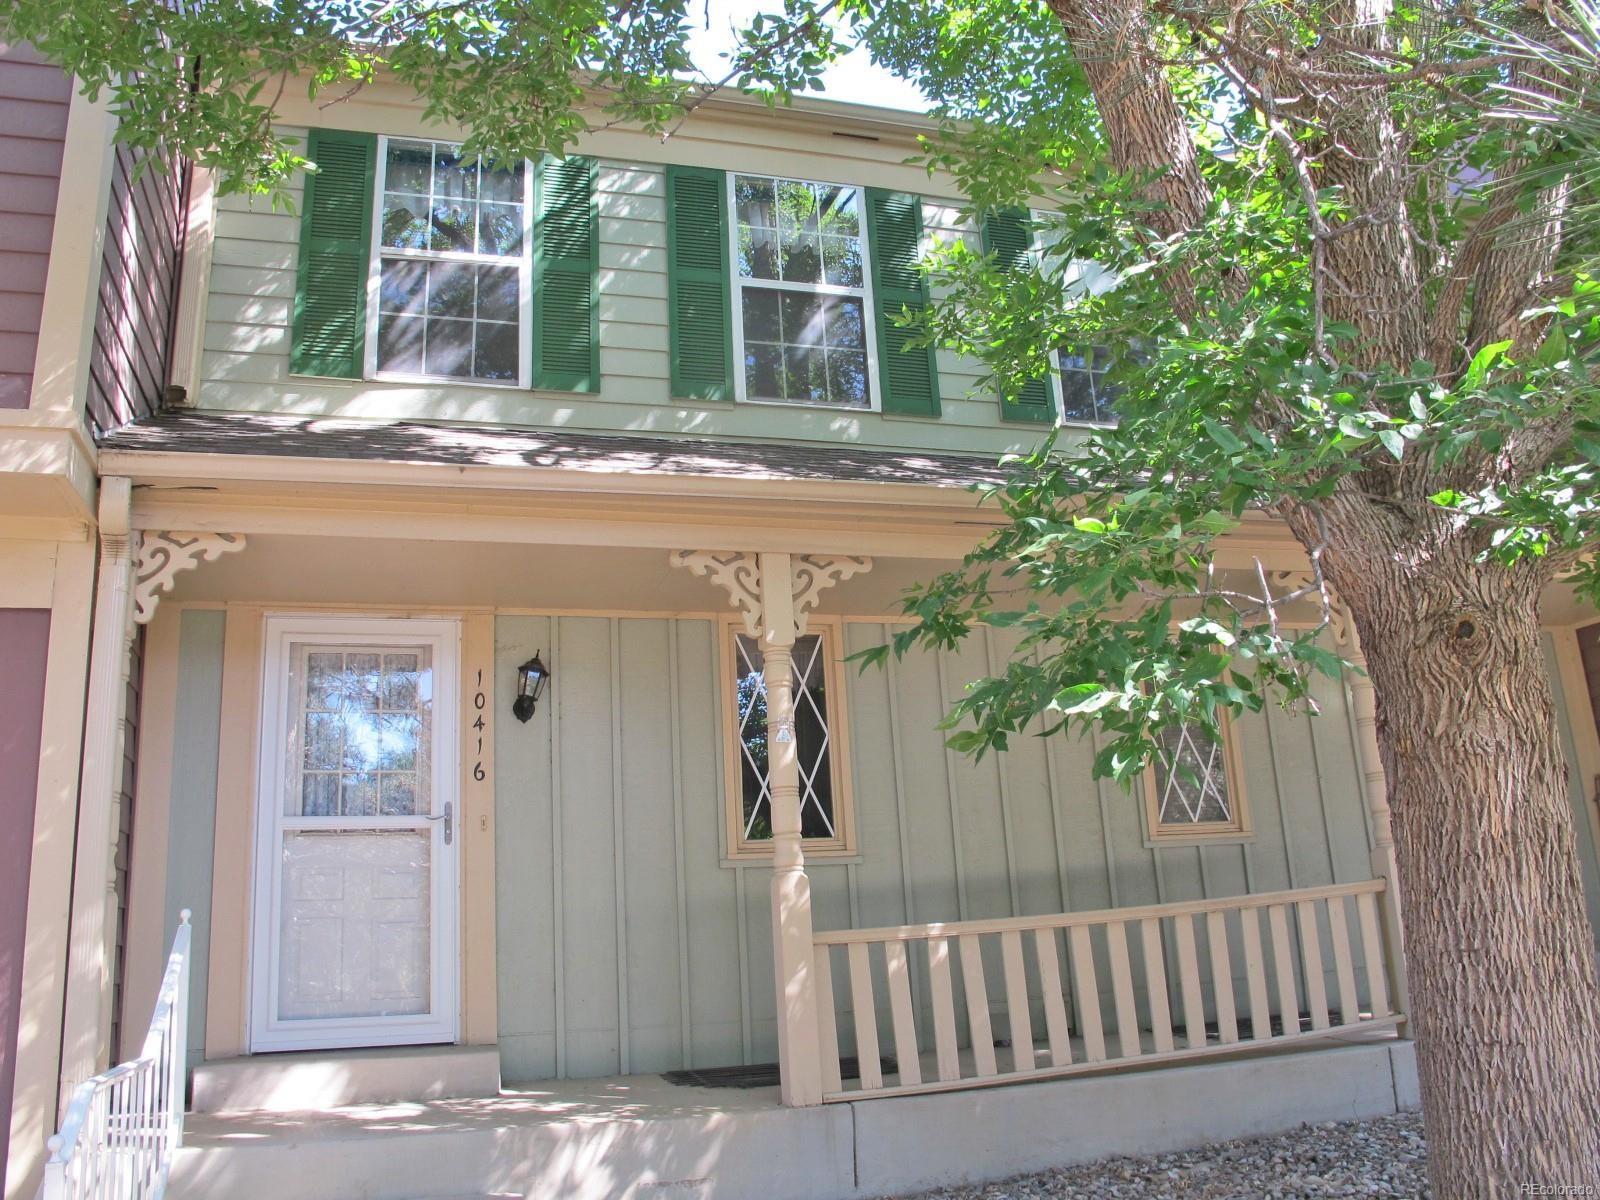 MLS# 6442687 - 2 - 10416 W Dartmouth Avenue, Lakewood, CO 80227